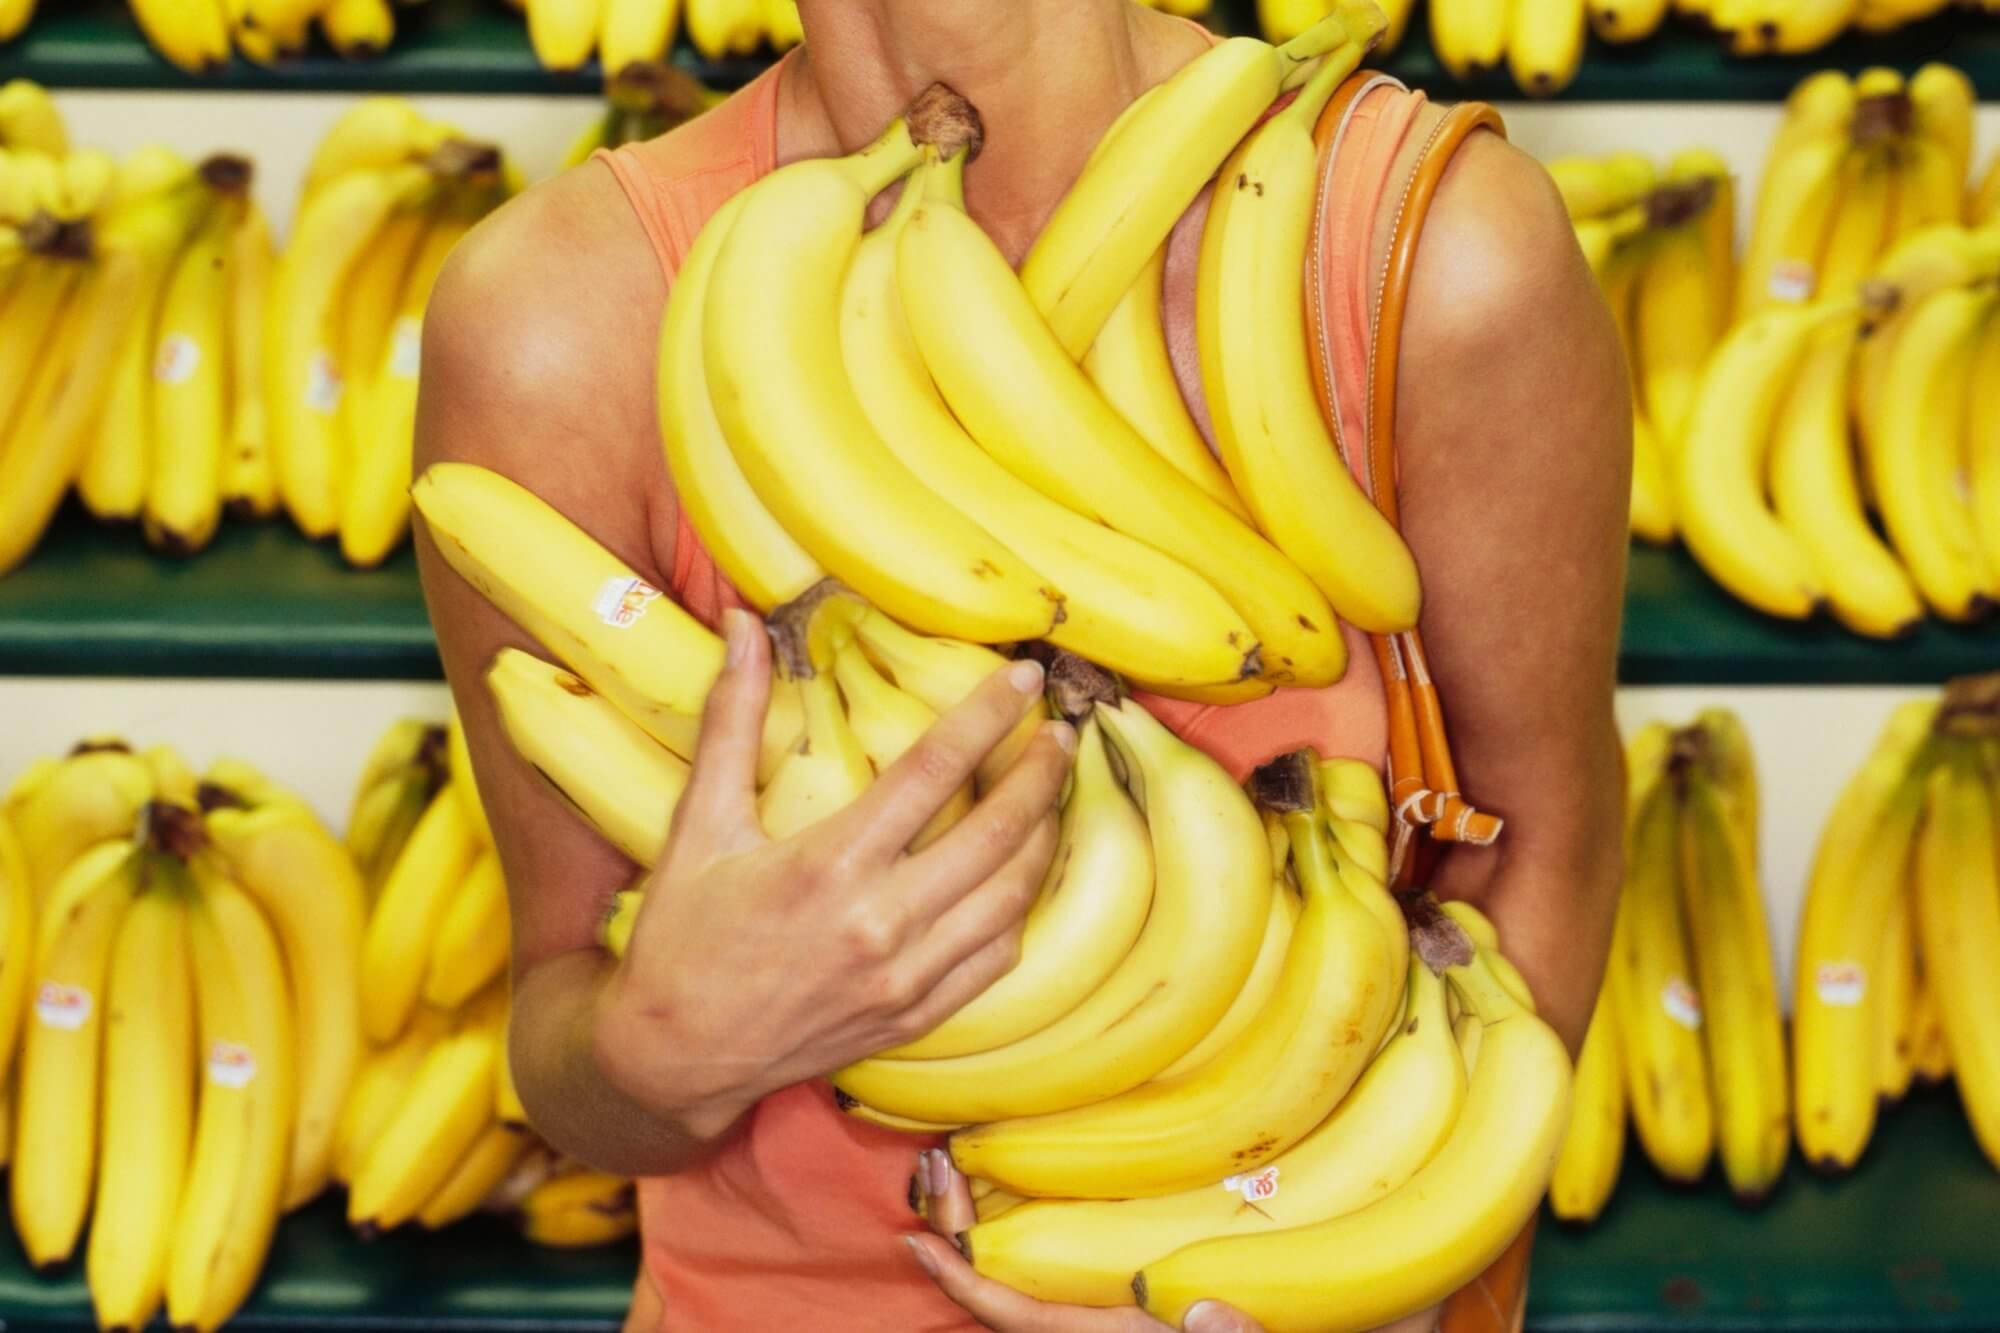 all-day-banana-diet